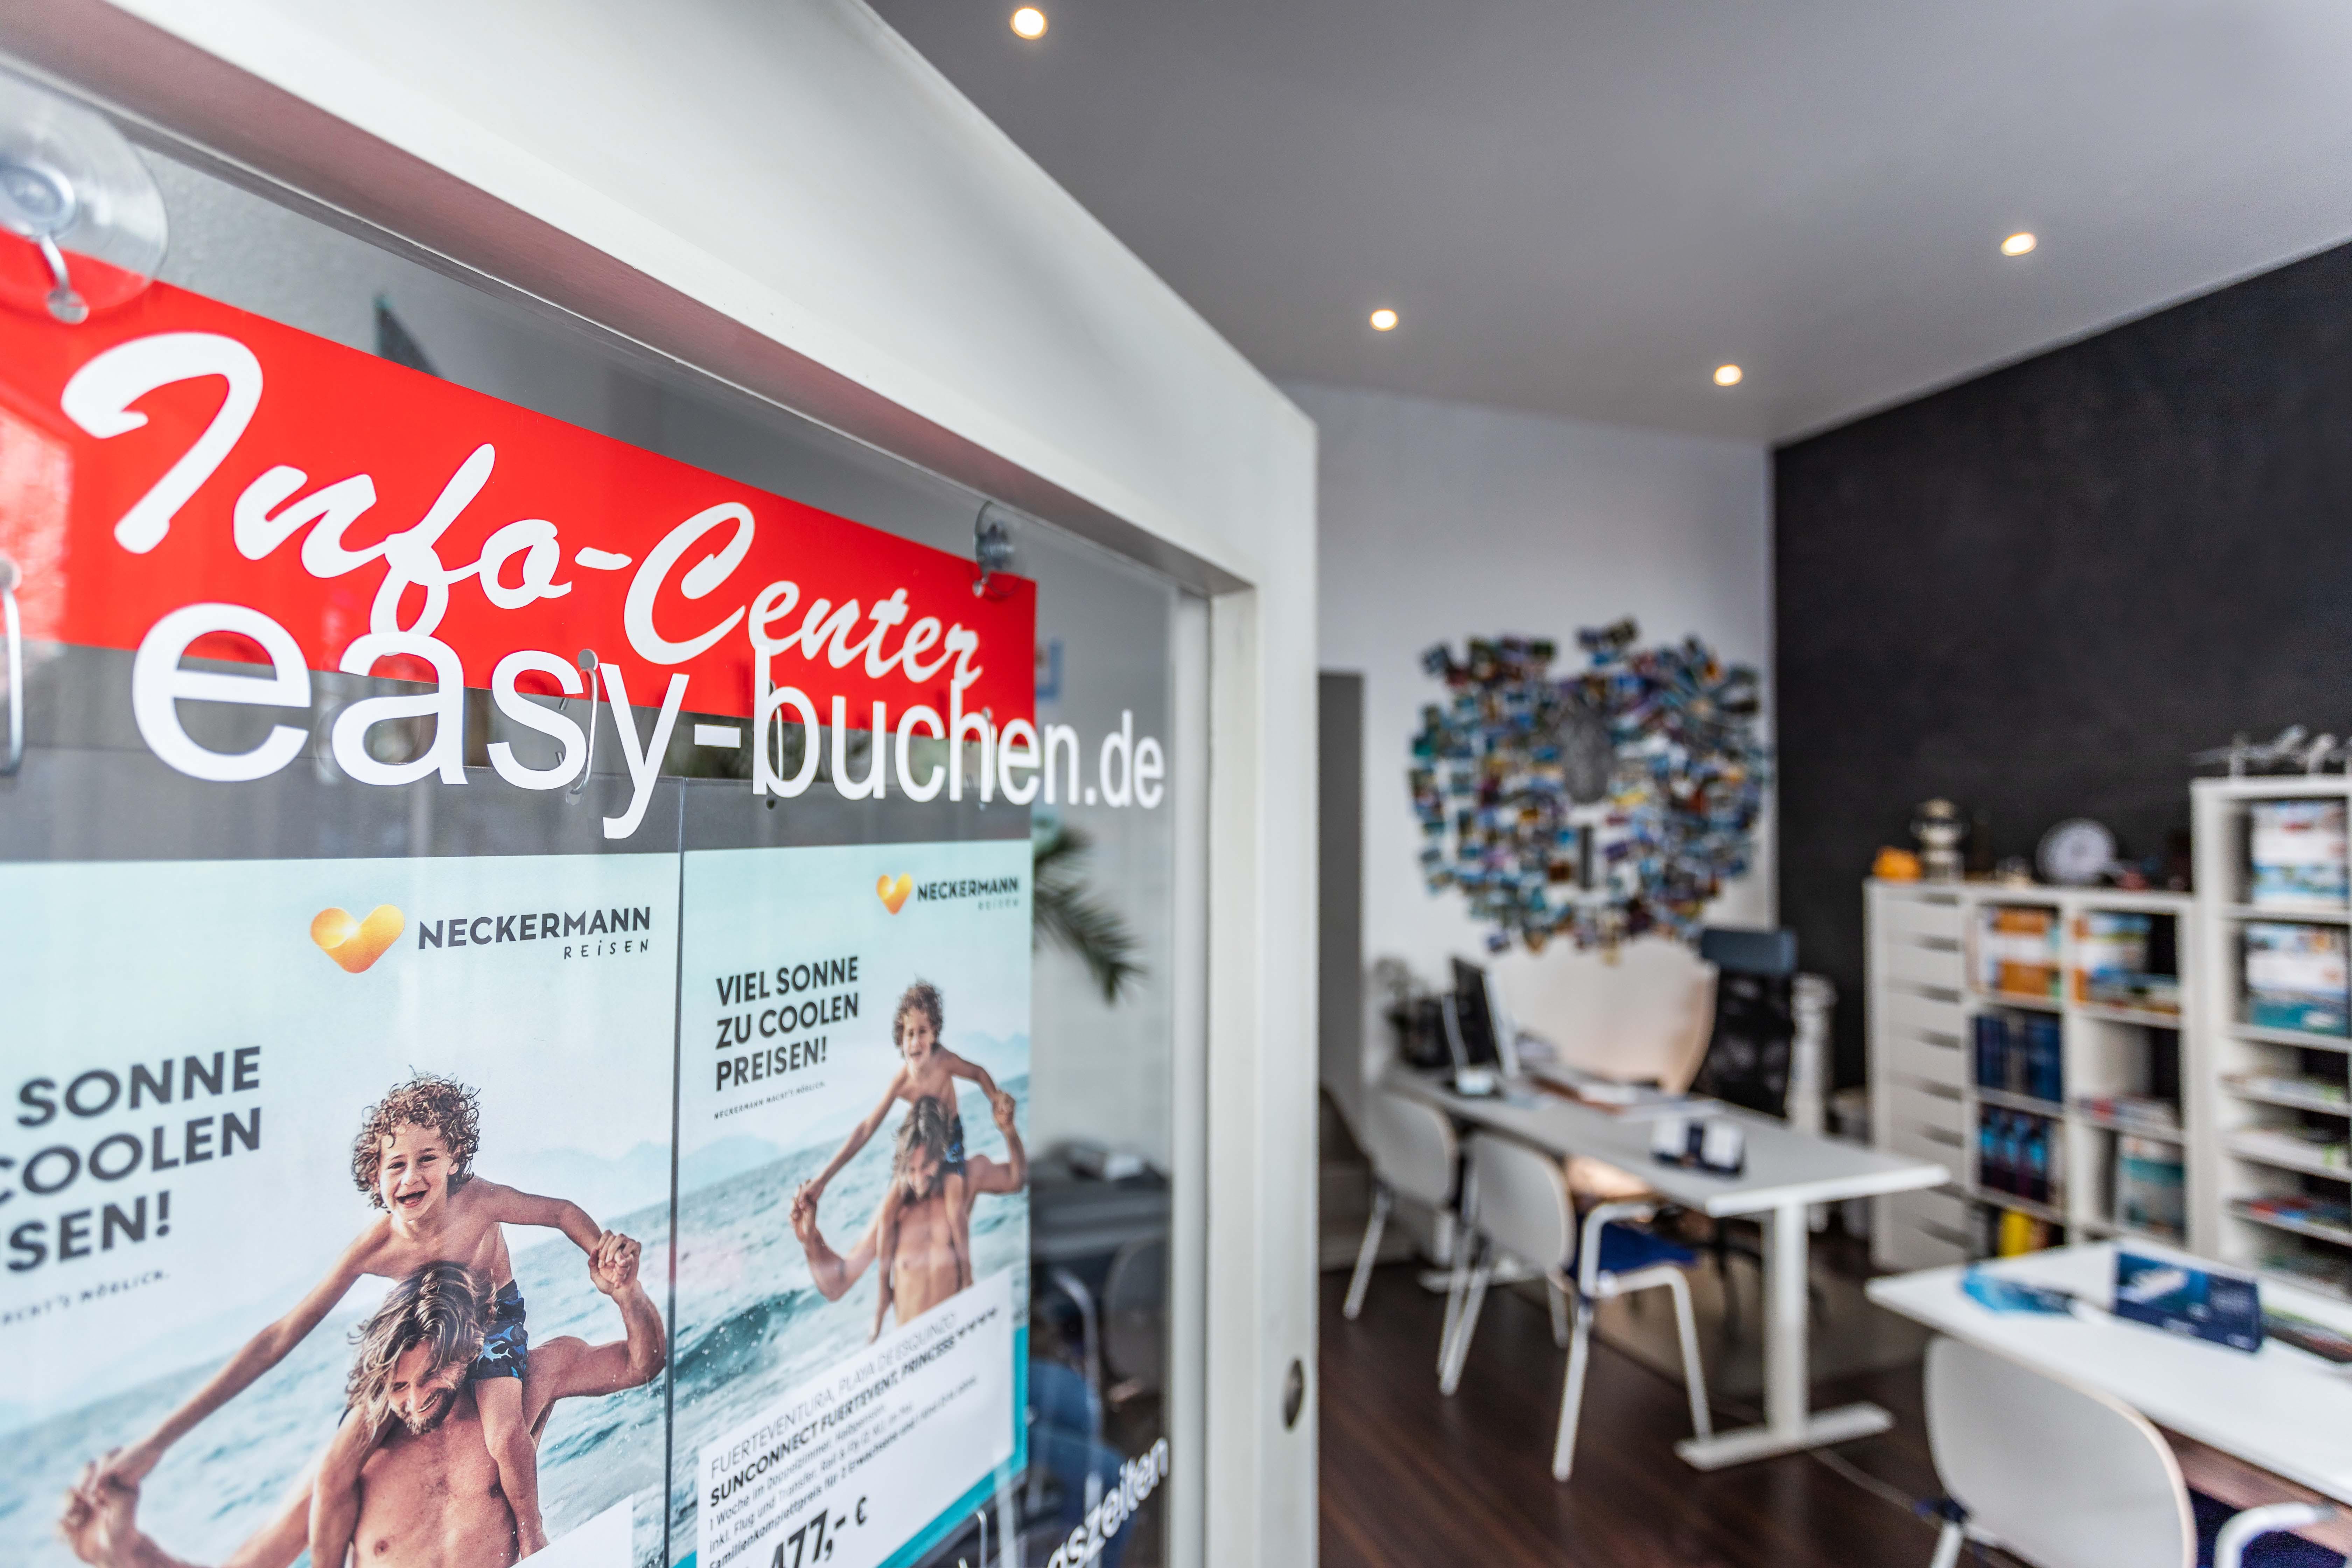 easy-buchen.de I Reisebüro Düsseldorf